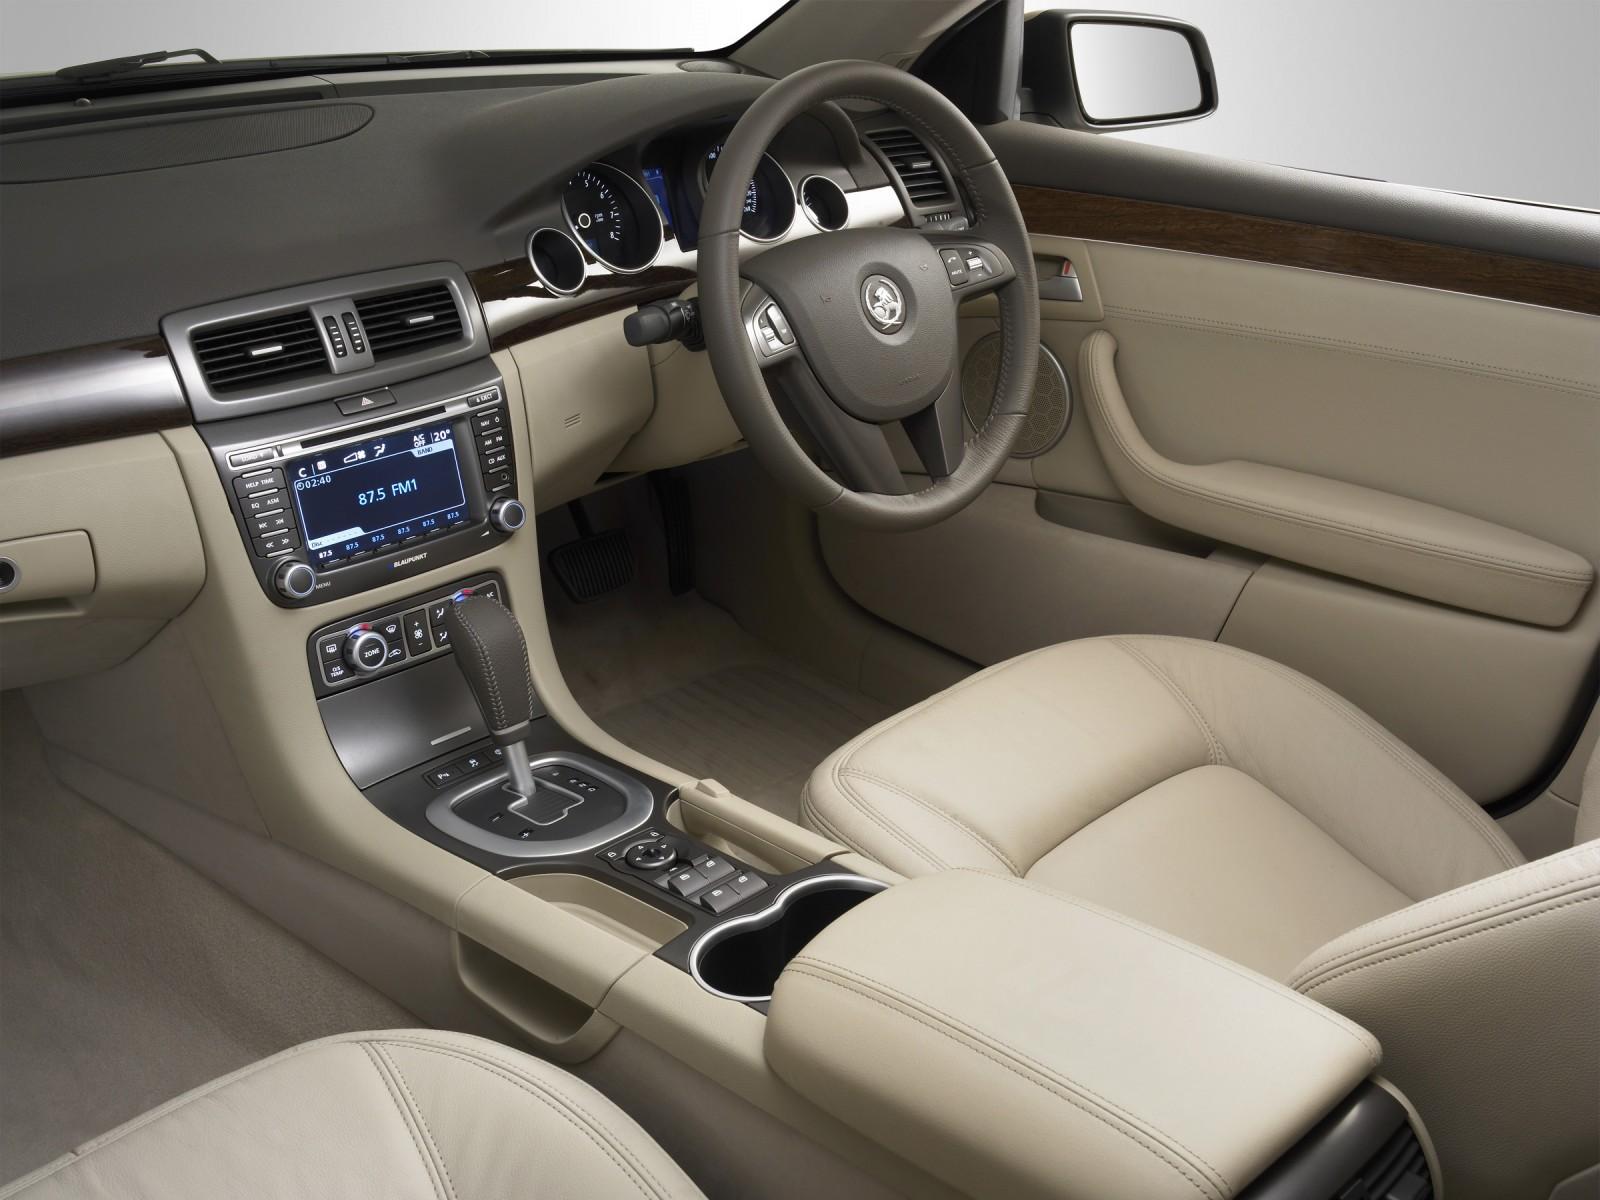 2010 Holden Wm Statesman Motor Desktop